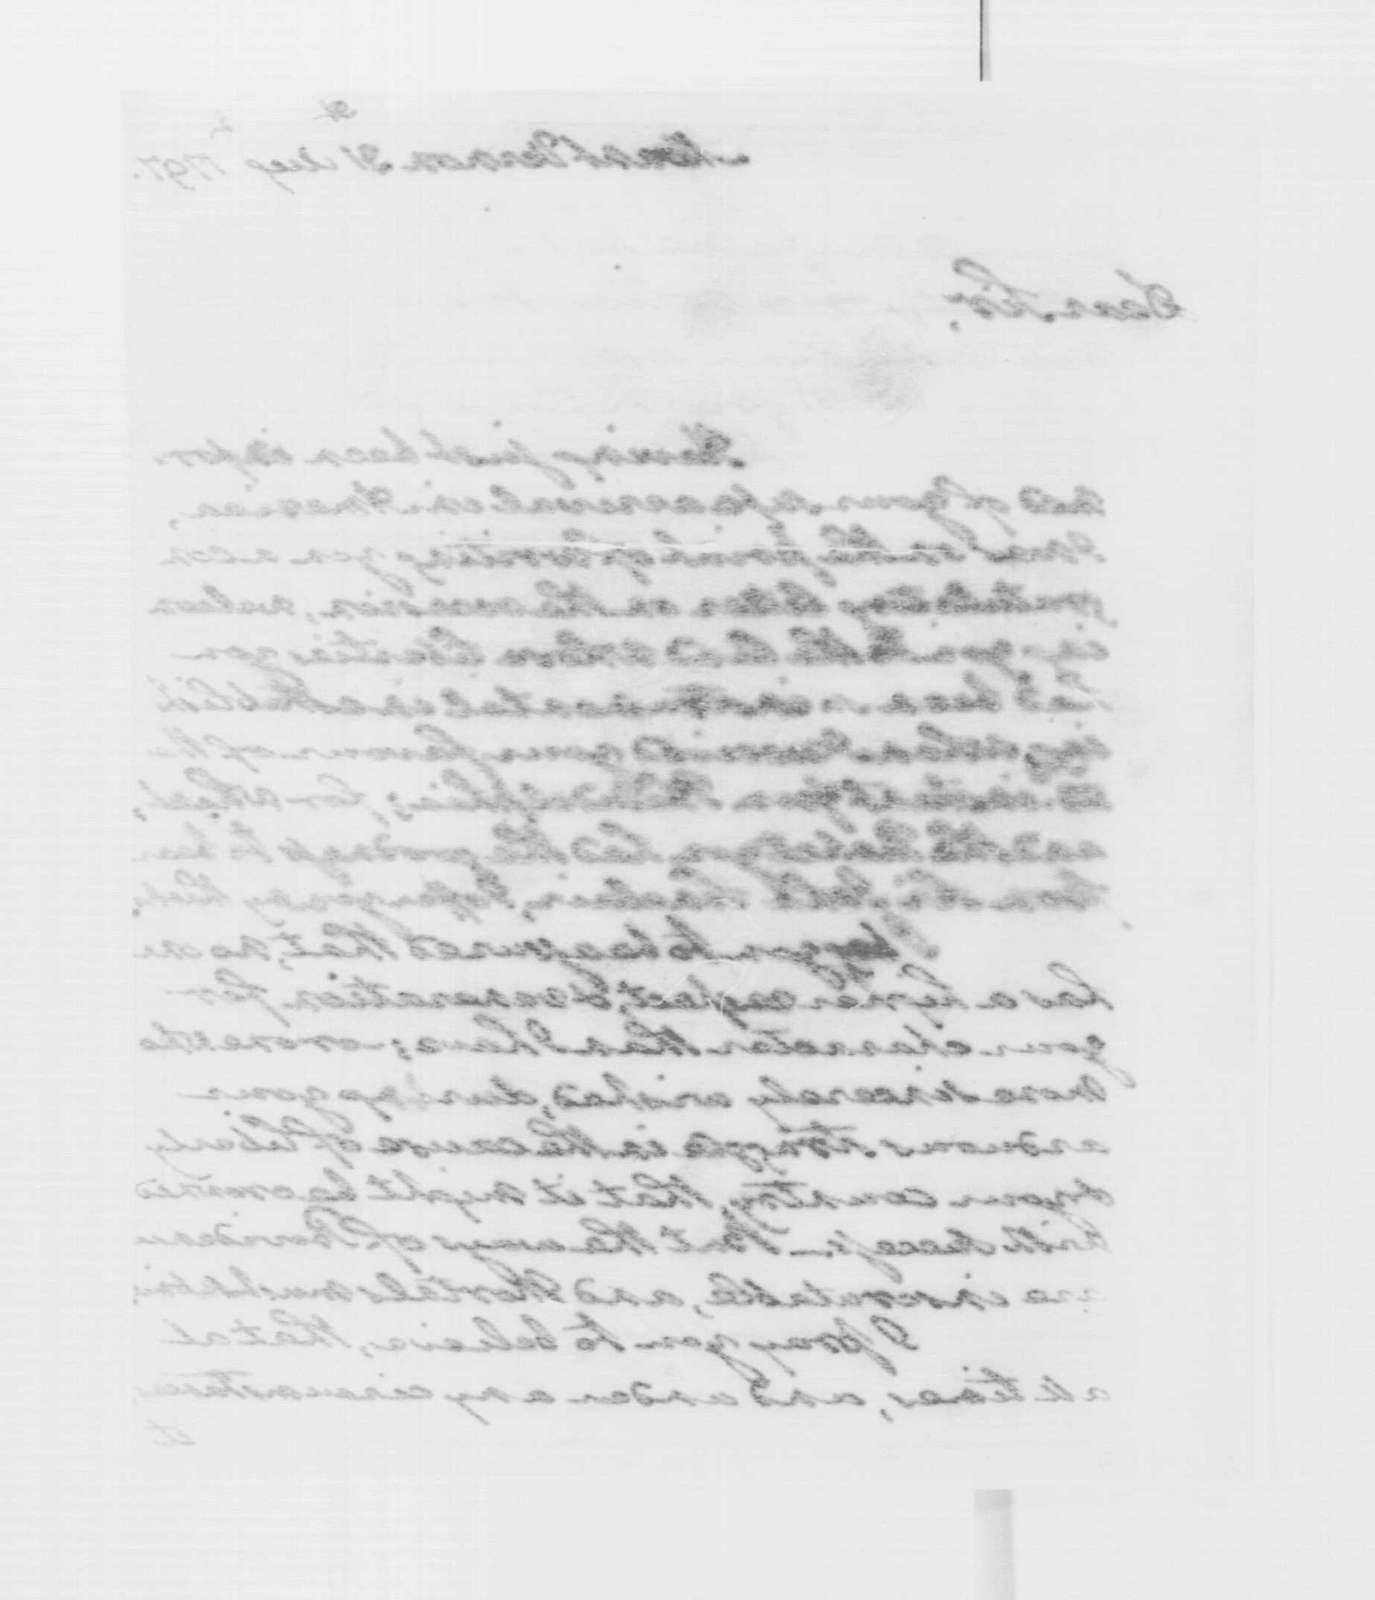 George Washington Papers, Series 4, General Correspondence: George Washington to Thaddeus Kosciuszko, August 31, 1797